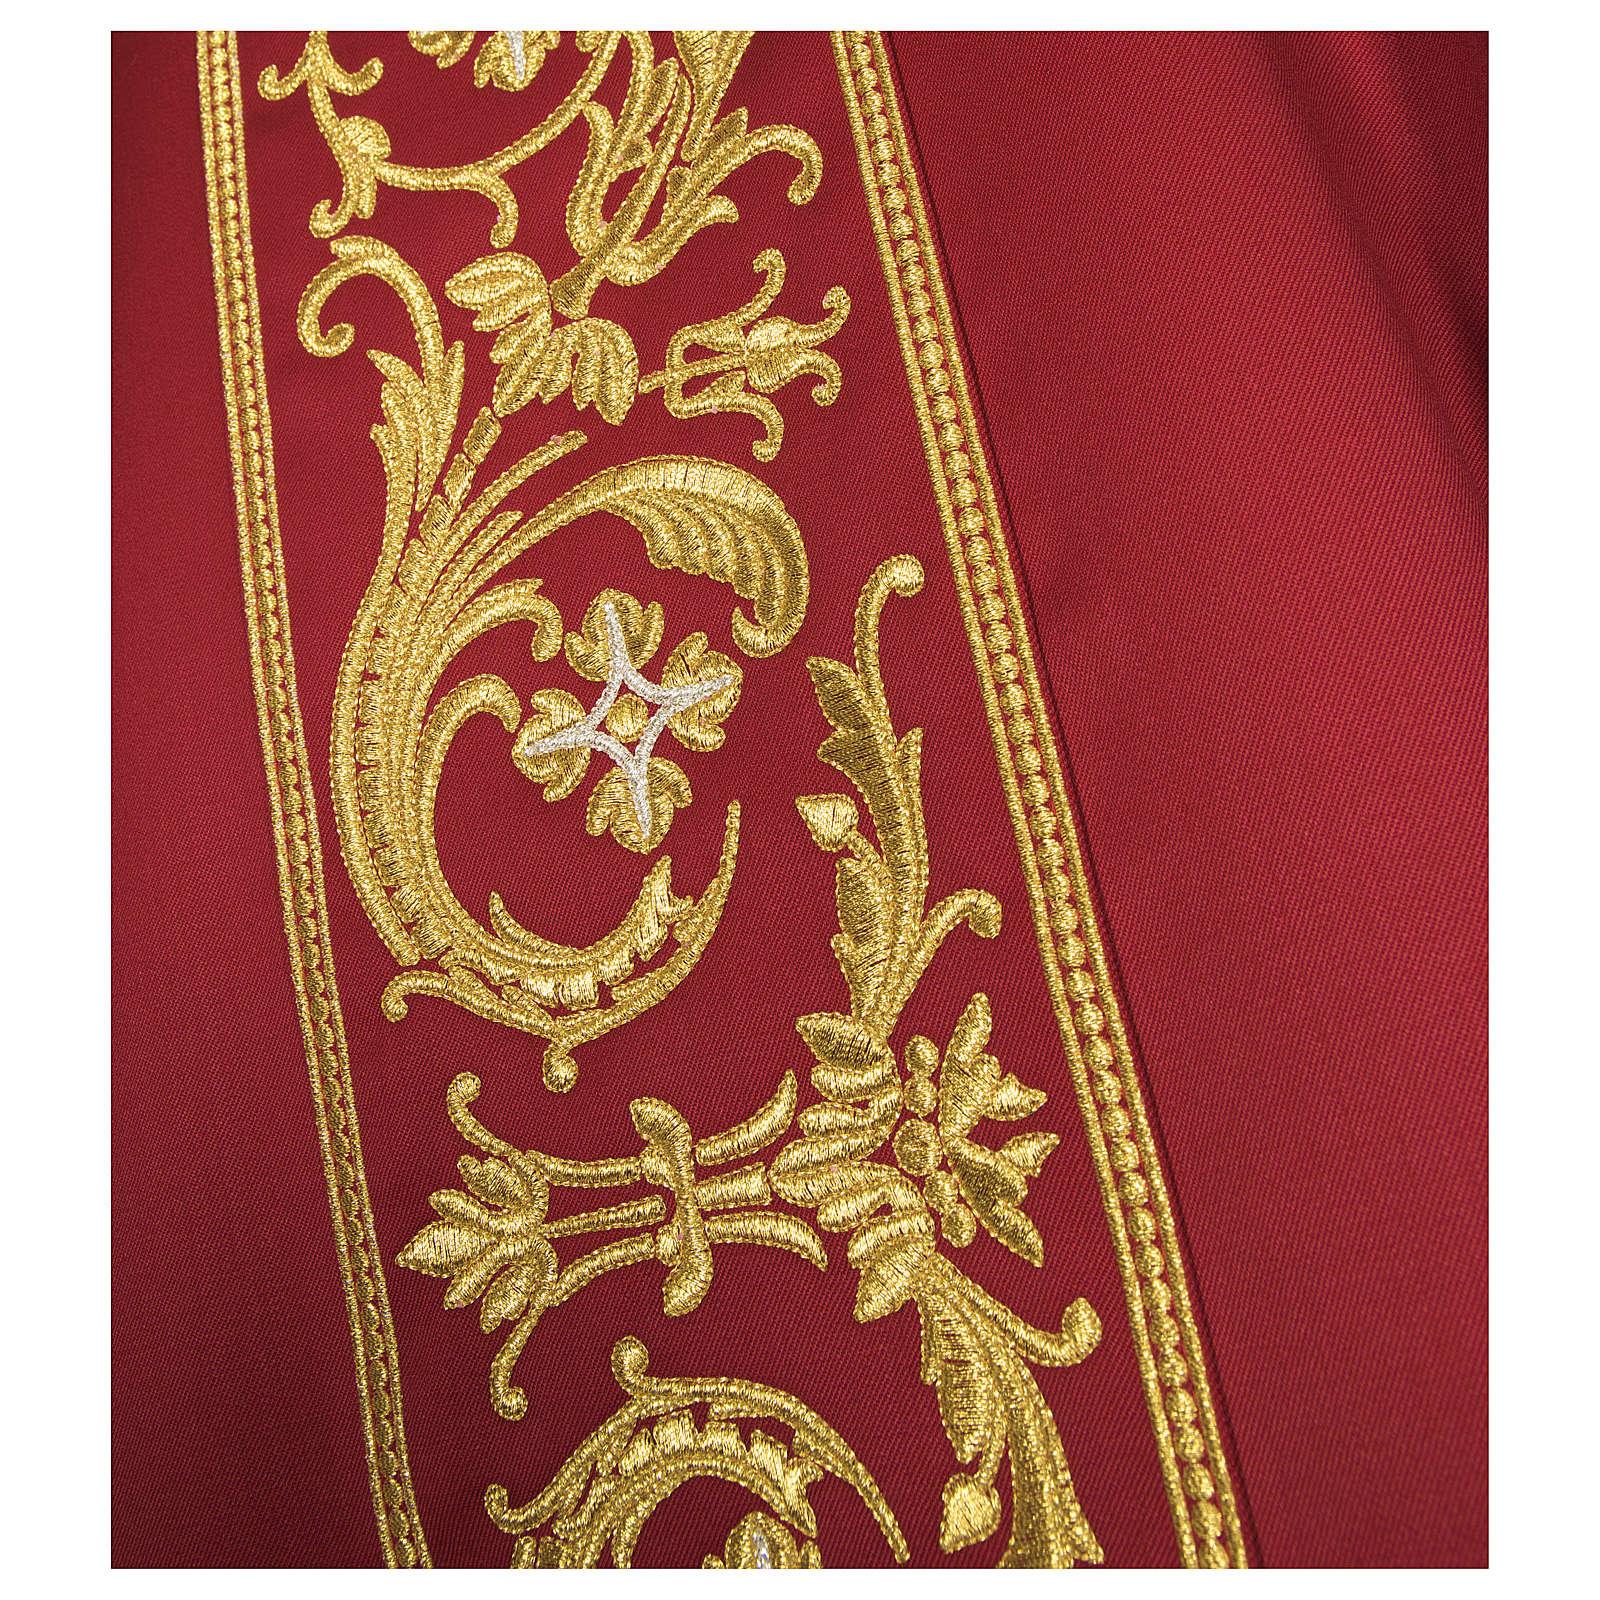 Casula lana pura ricamo barocco 4